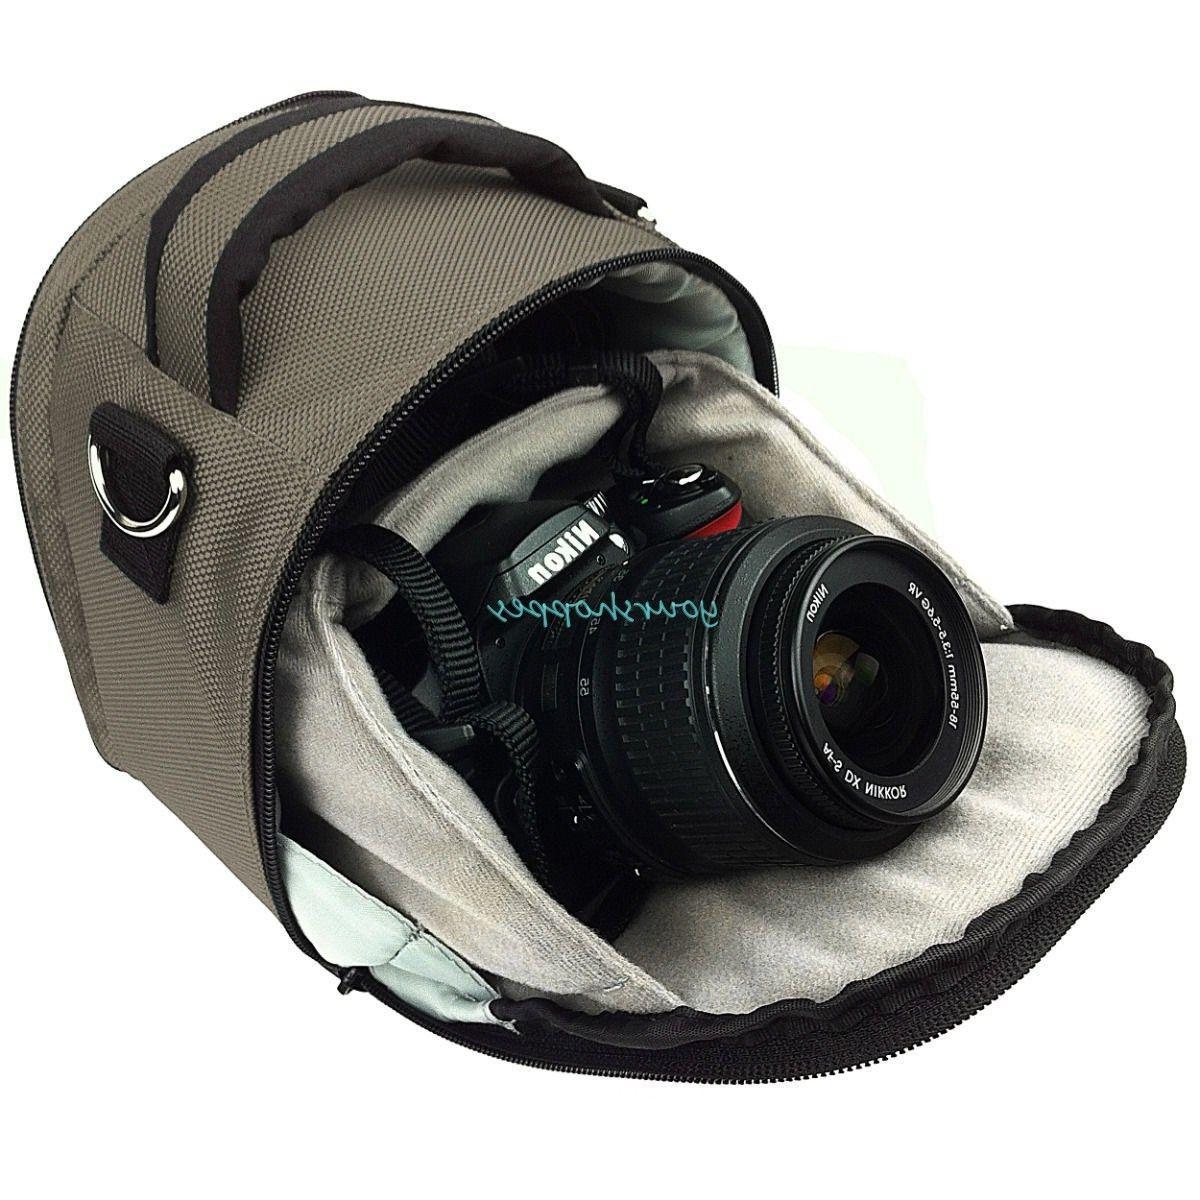 VanGoddy Shoulder Camera For Canon Powershot SX740 D3500